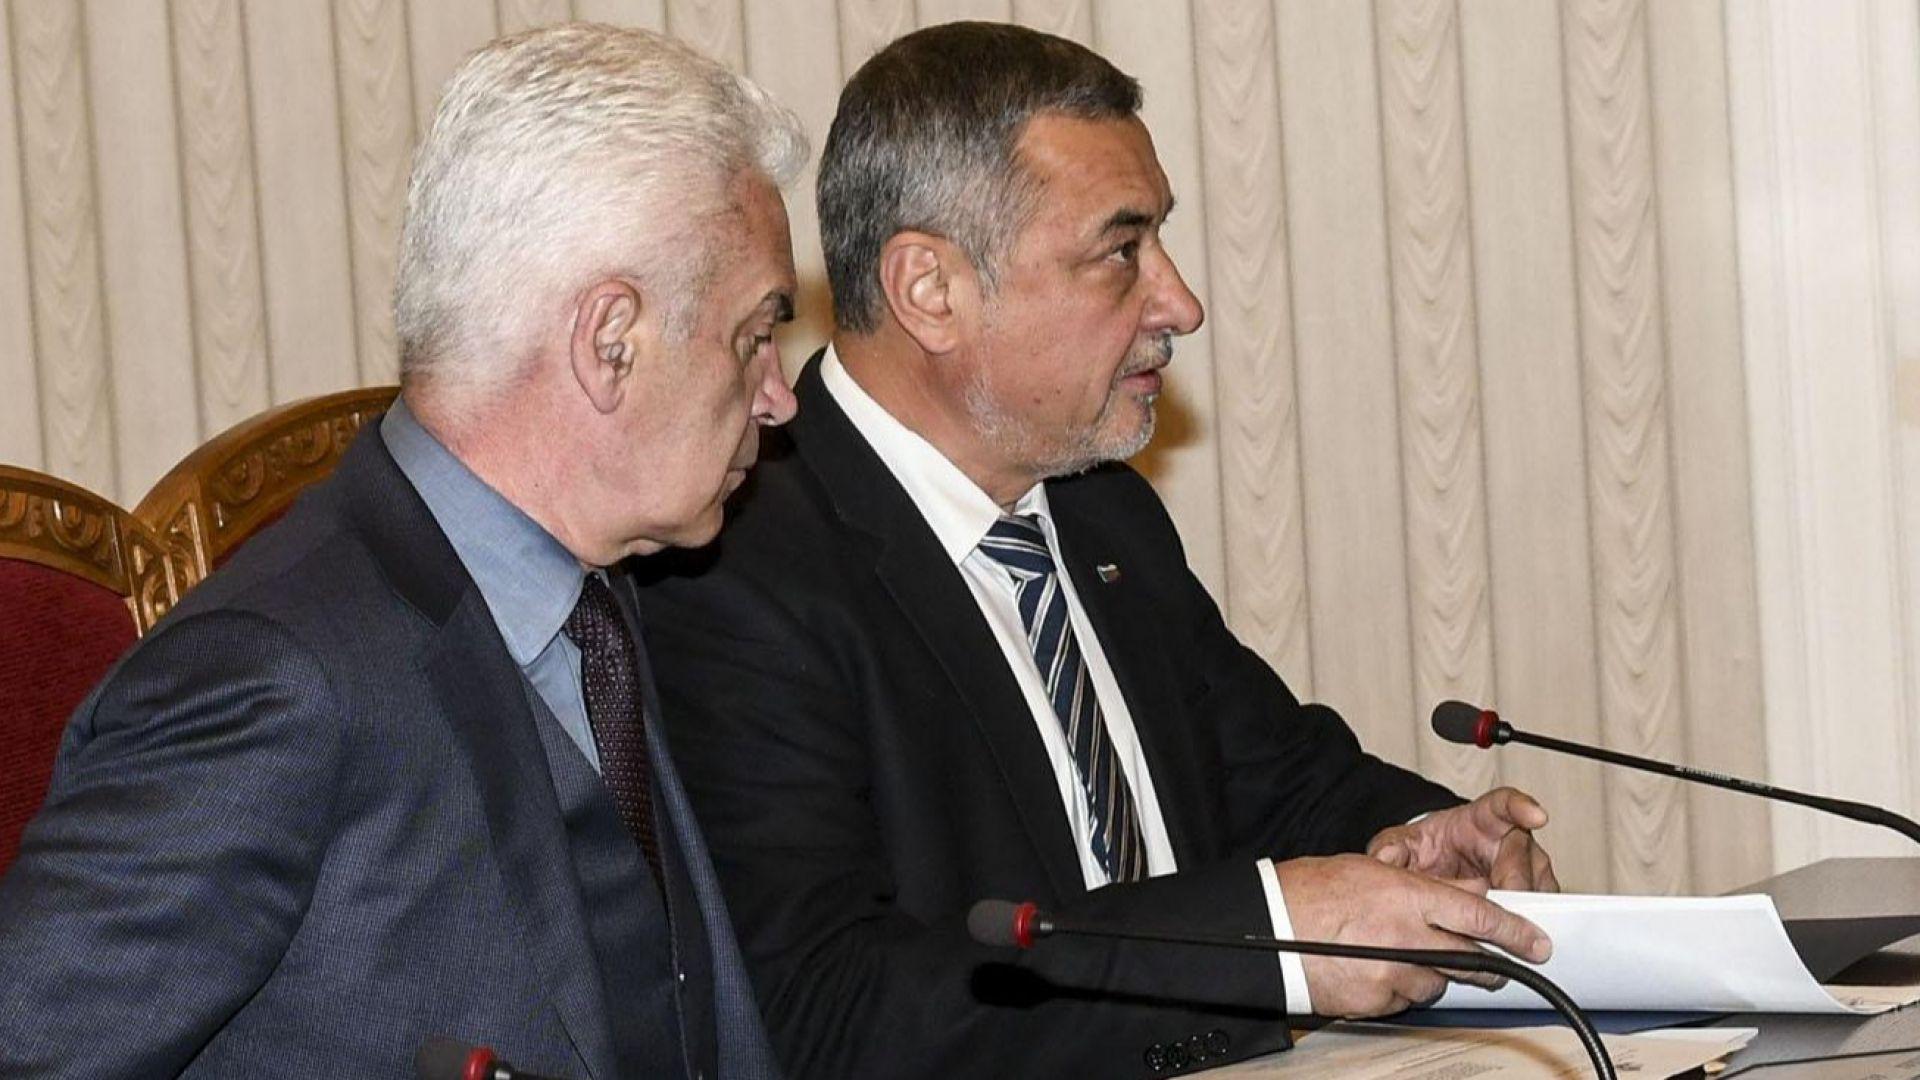 Словесните престрелки между Волен Сидеров и Валери Симеонов ескалираха в